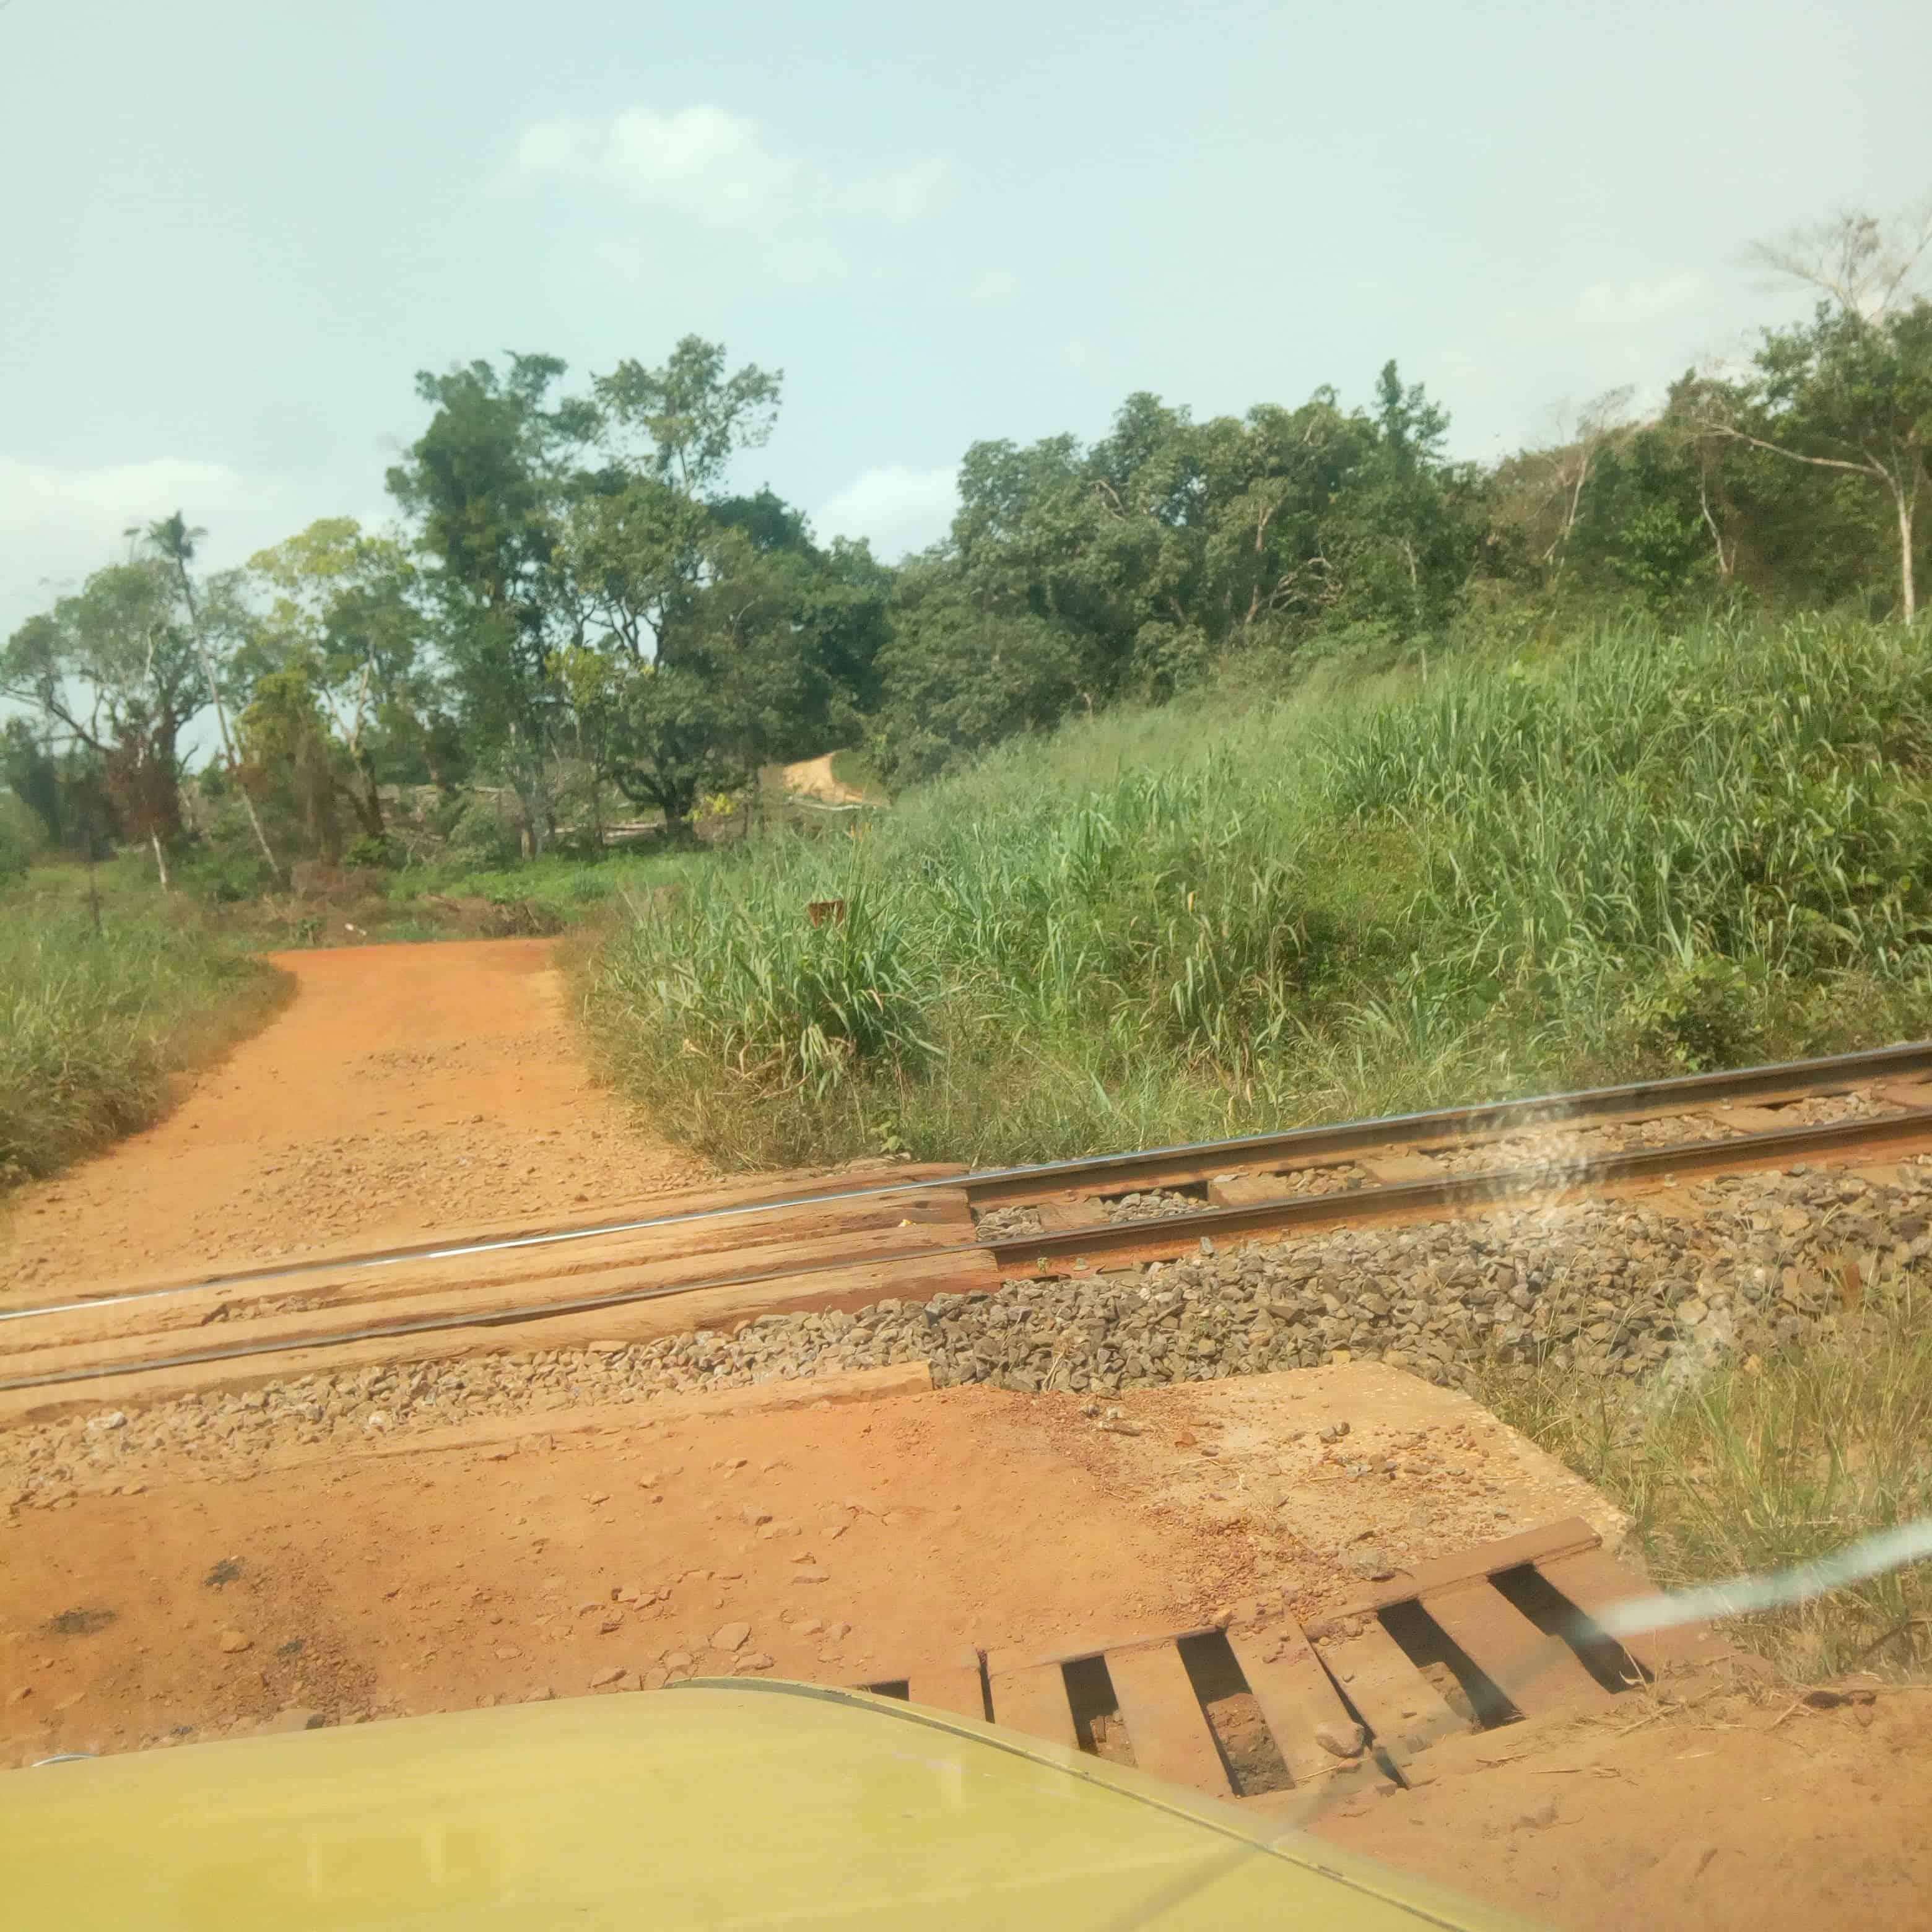 Land for sale at Douala, PK 27, Carrefour PK31 - 500 m2 - 2 500 000 FCFA